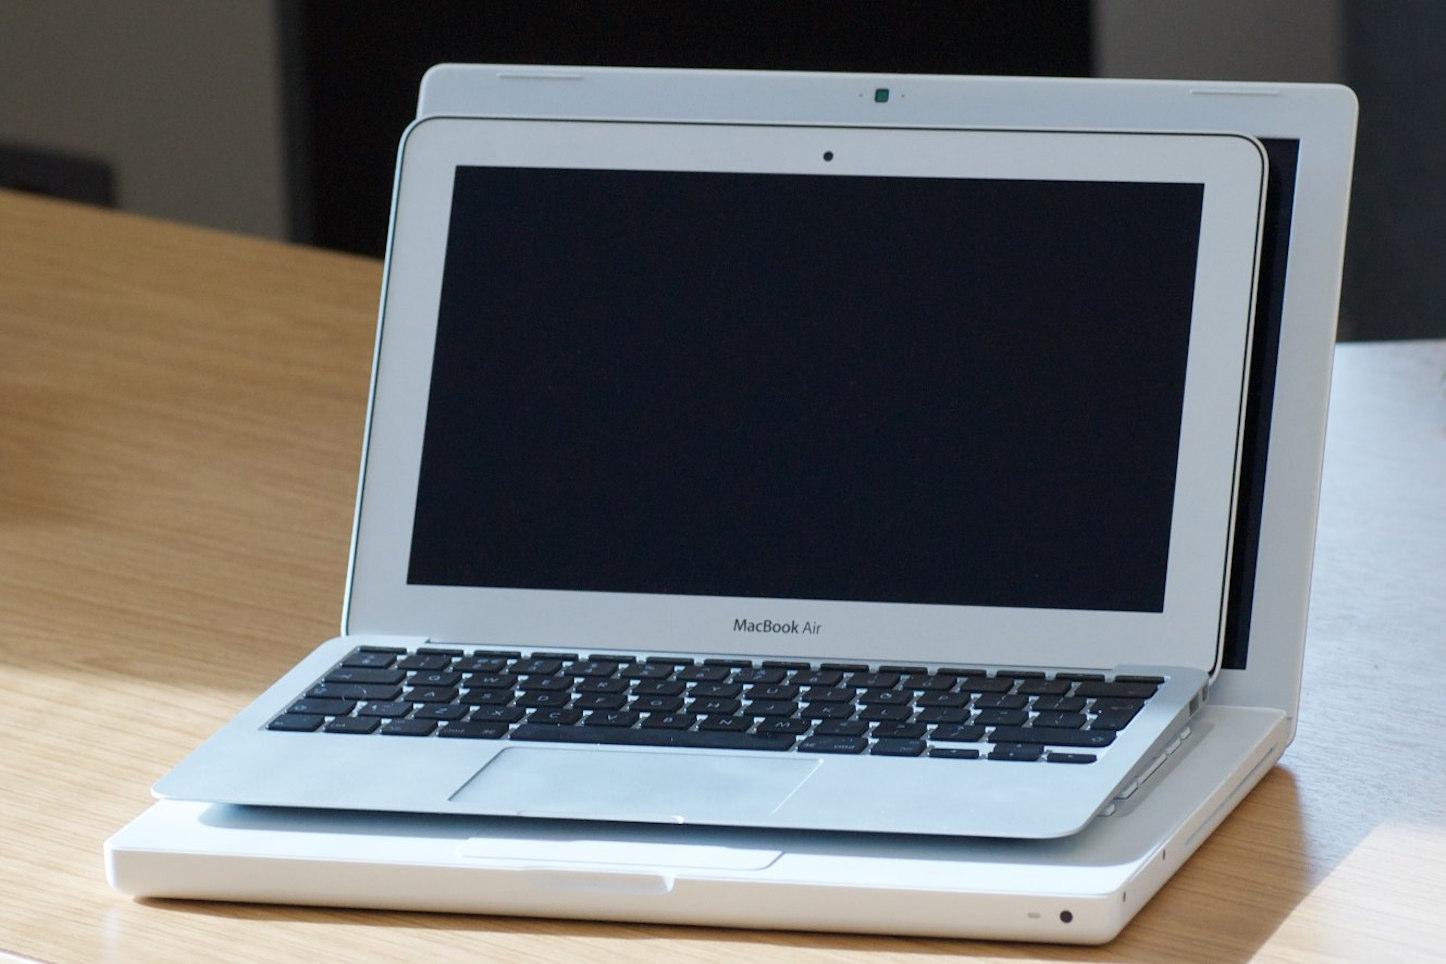 Macbook air compare